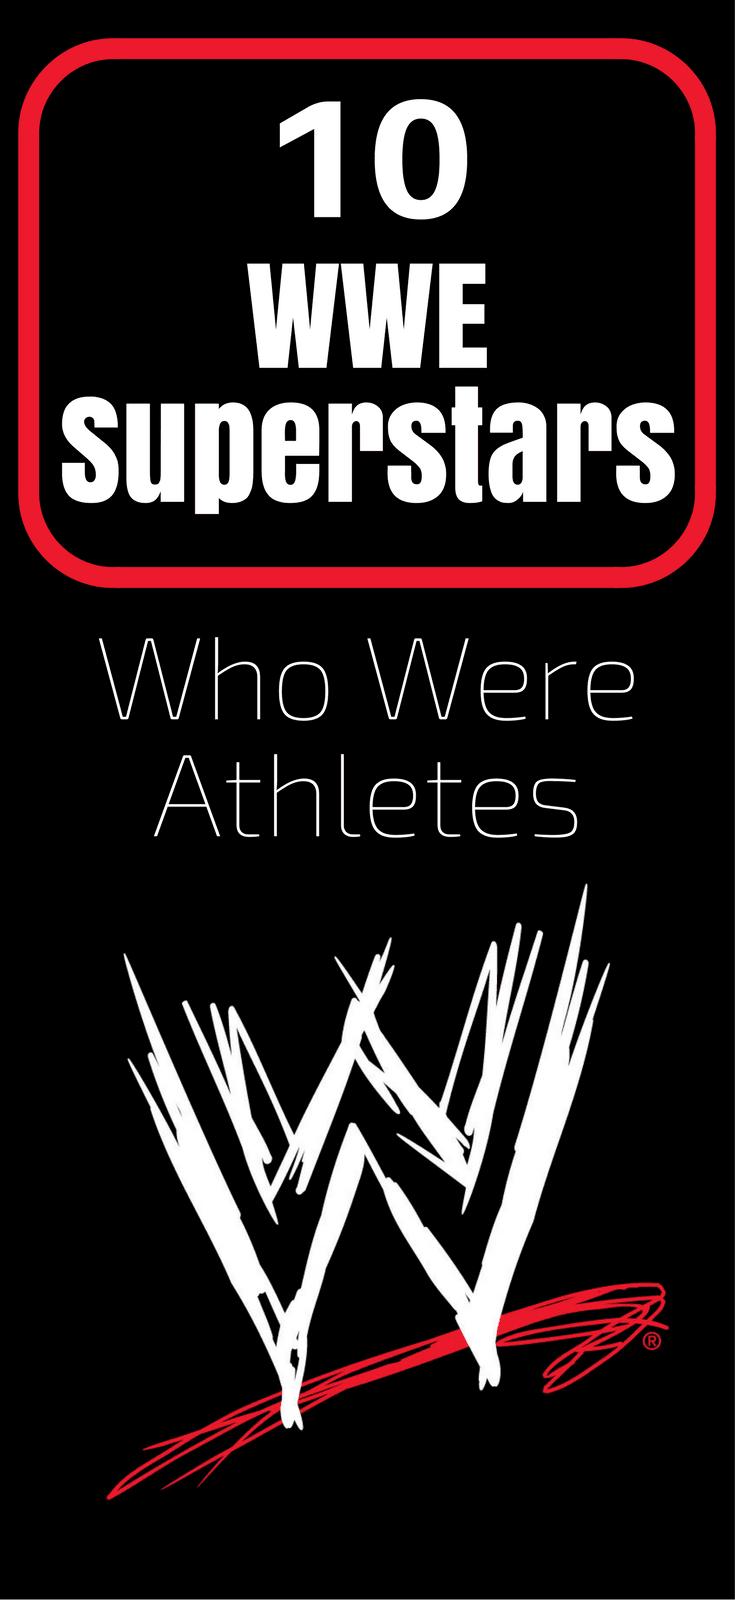 10 WWE Superstars Who Were Athletes